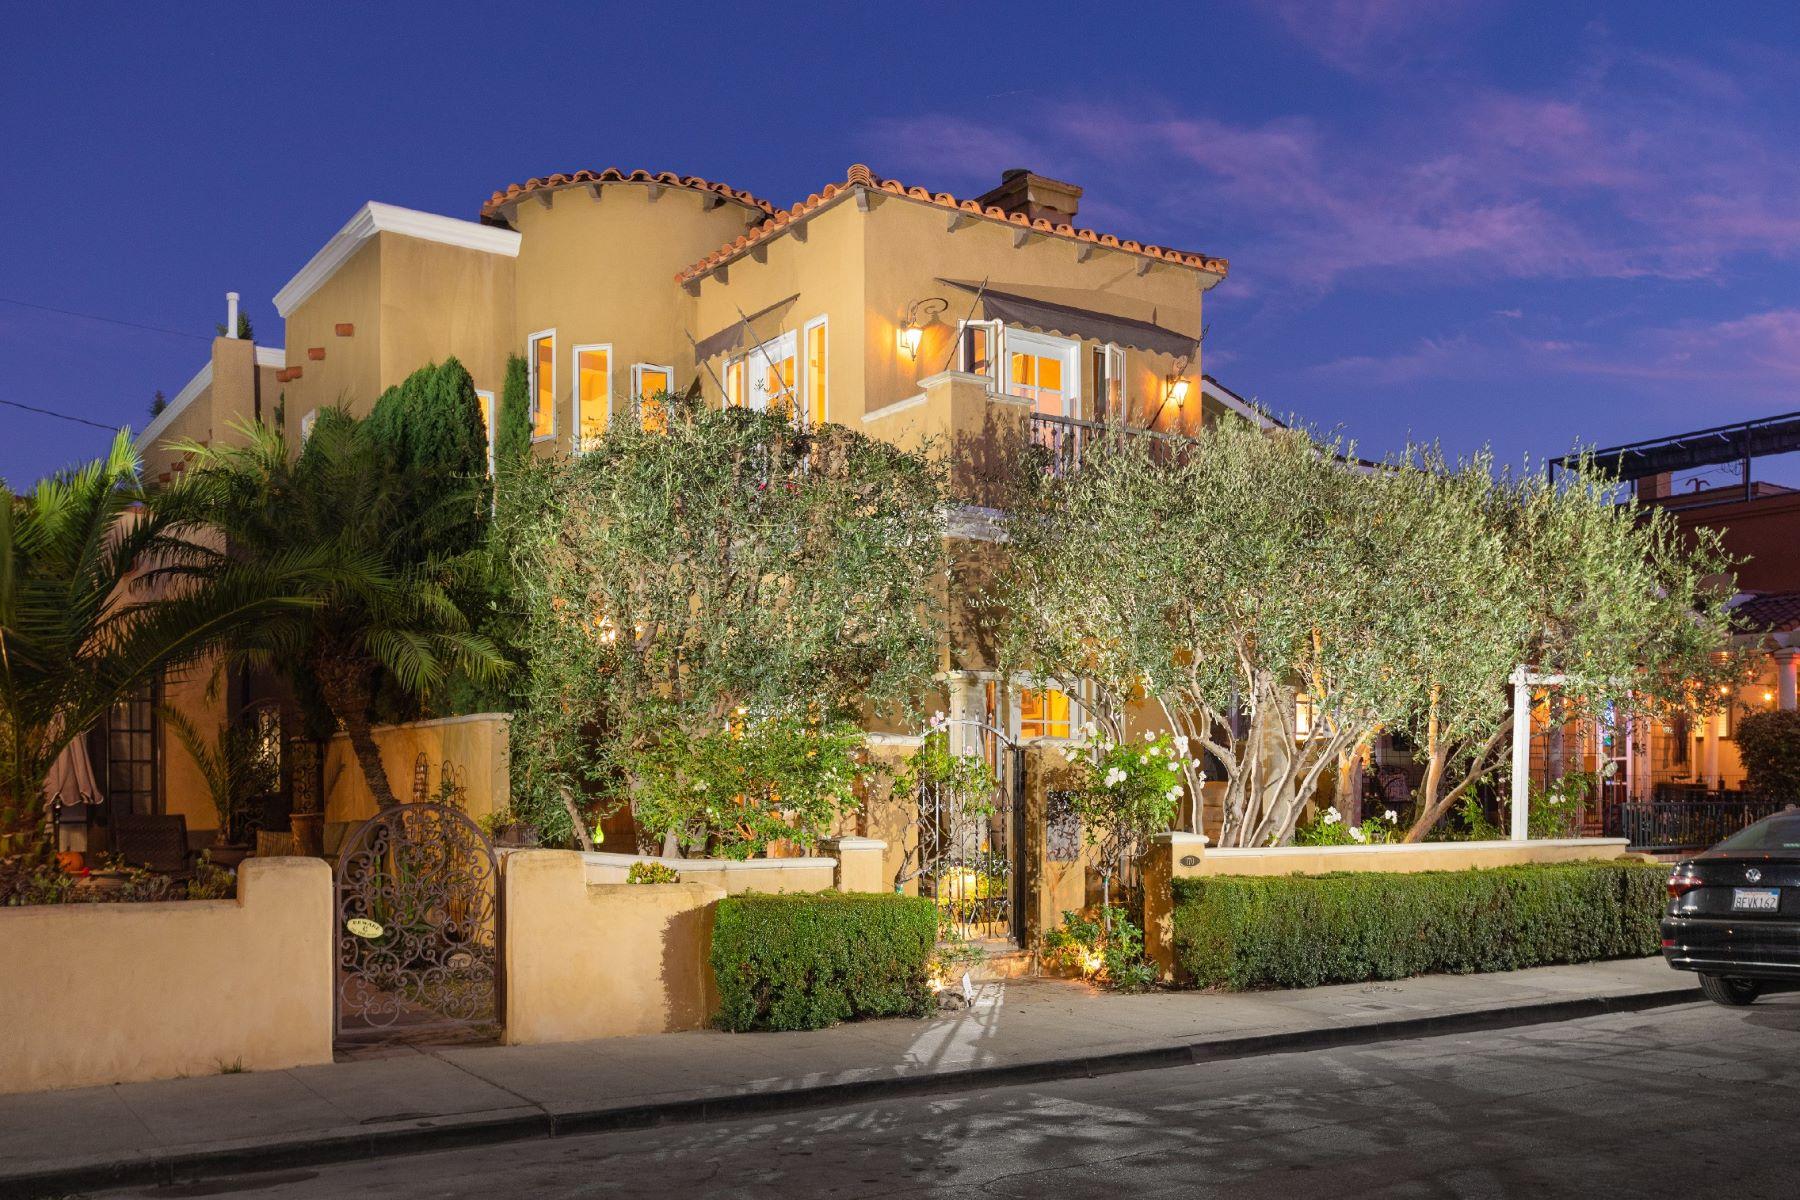 Single Family Homes for Sale at 170 Santa Ana Ave Long Beach, California 90803 United States